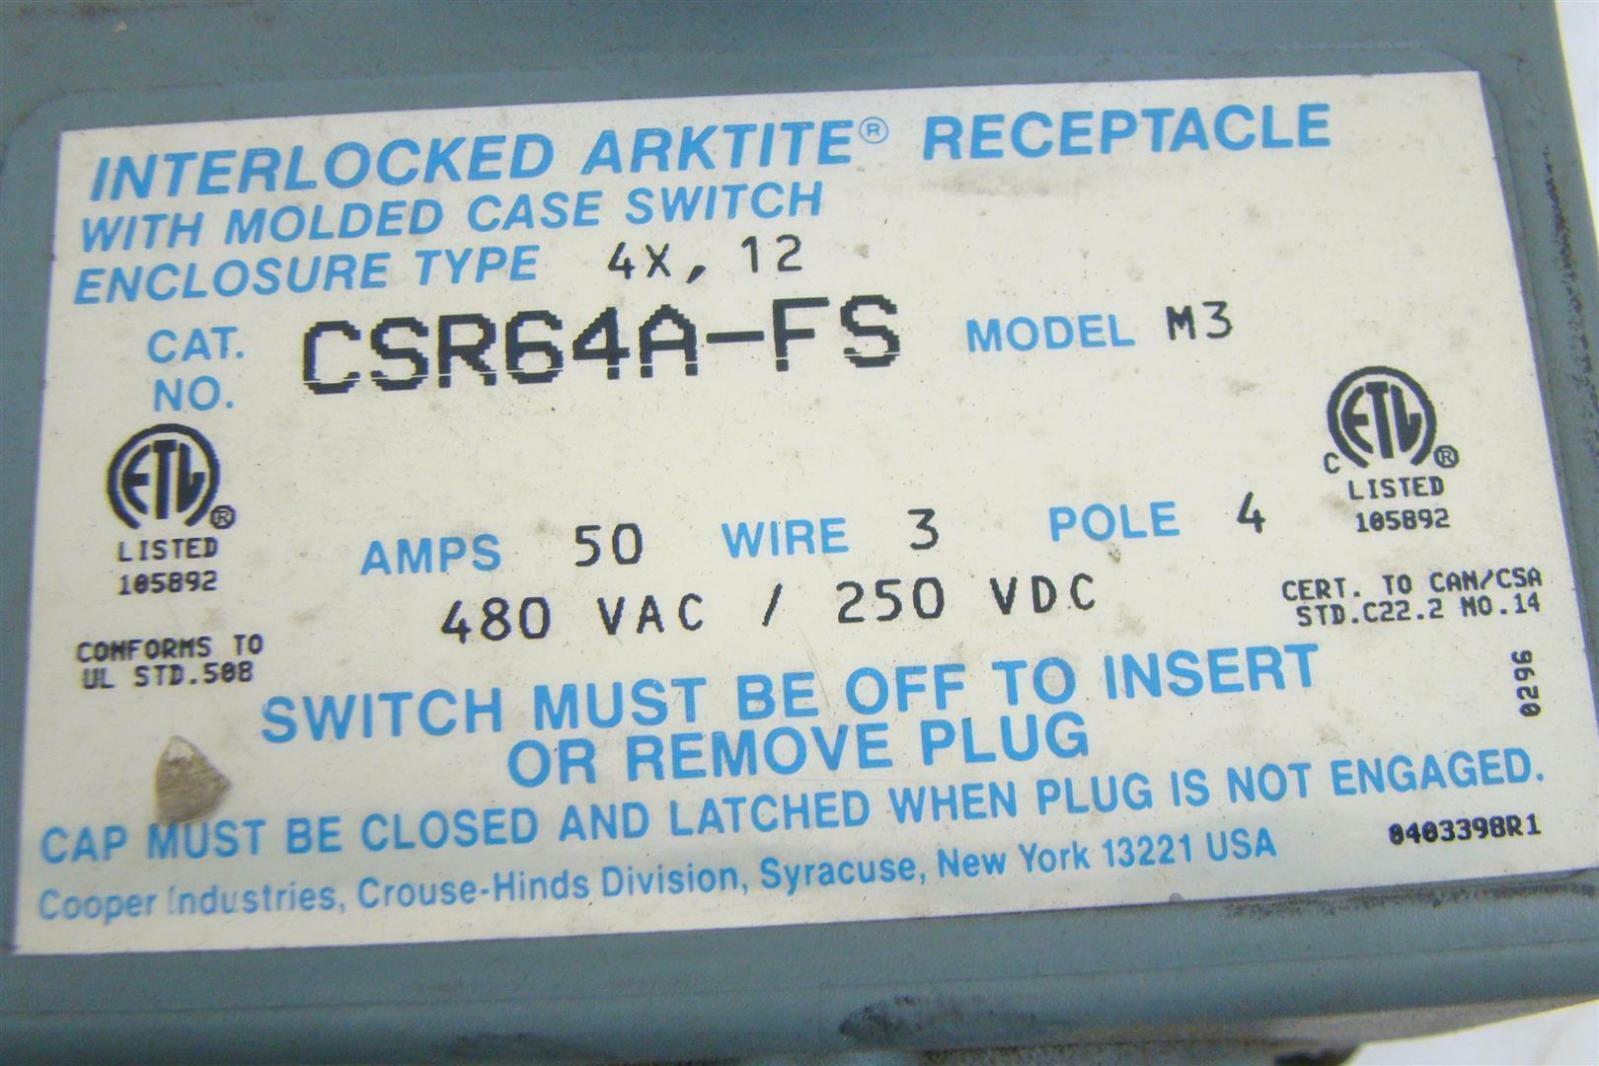 Interlocked Arktite Receptacle 50a, 3 wire, 4 P, 480 V M3 | Joseph ...